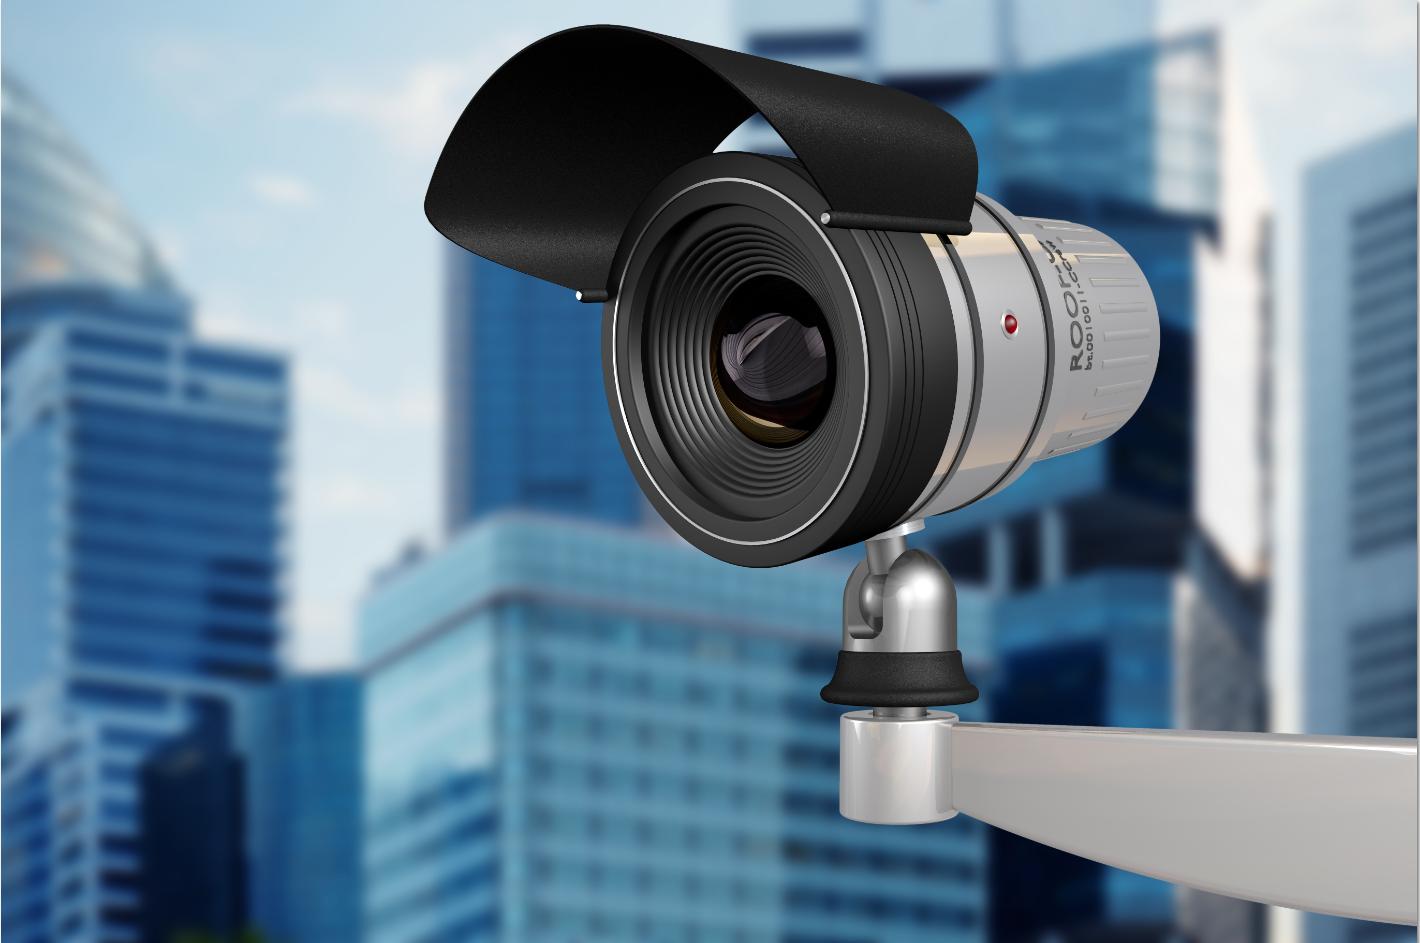 Security Camera Repair in Eastvale